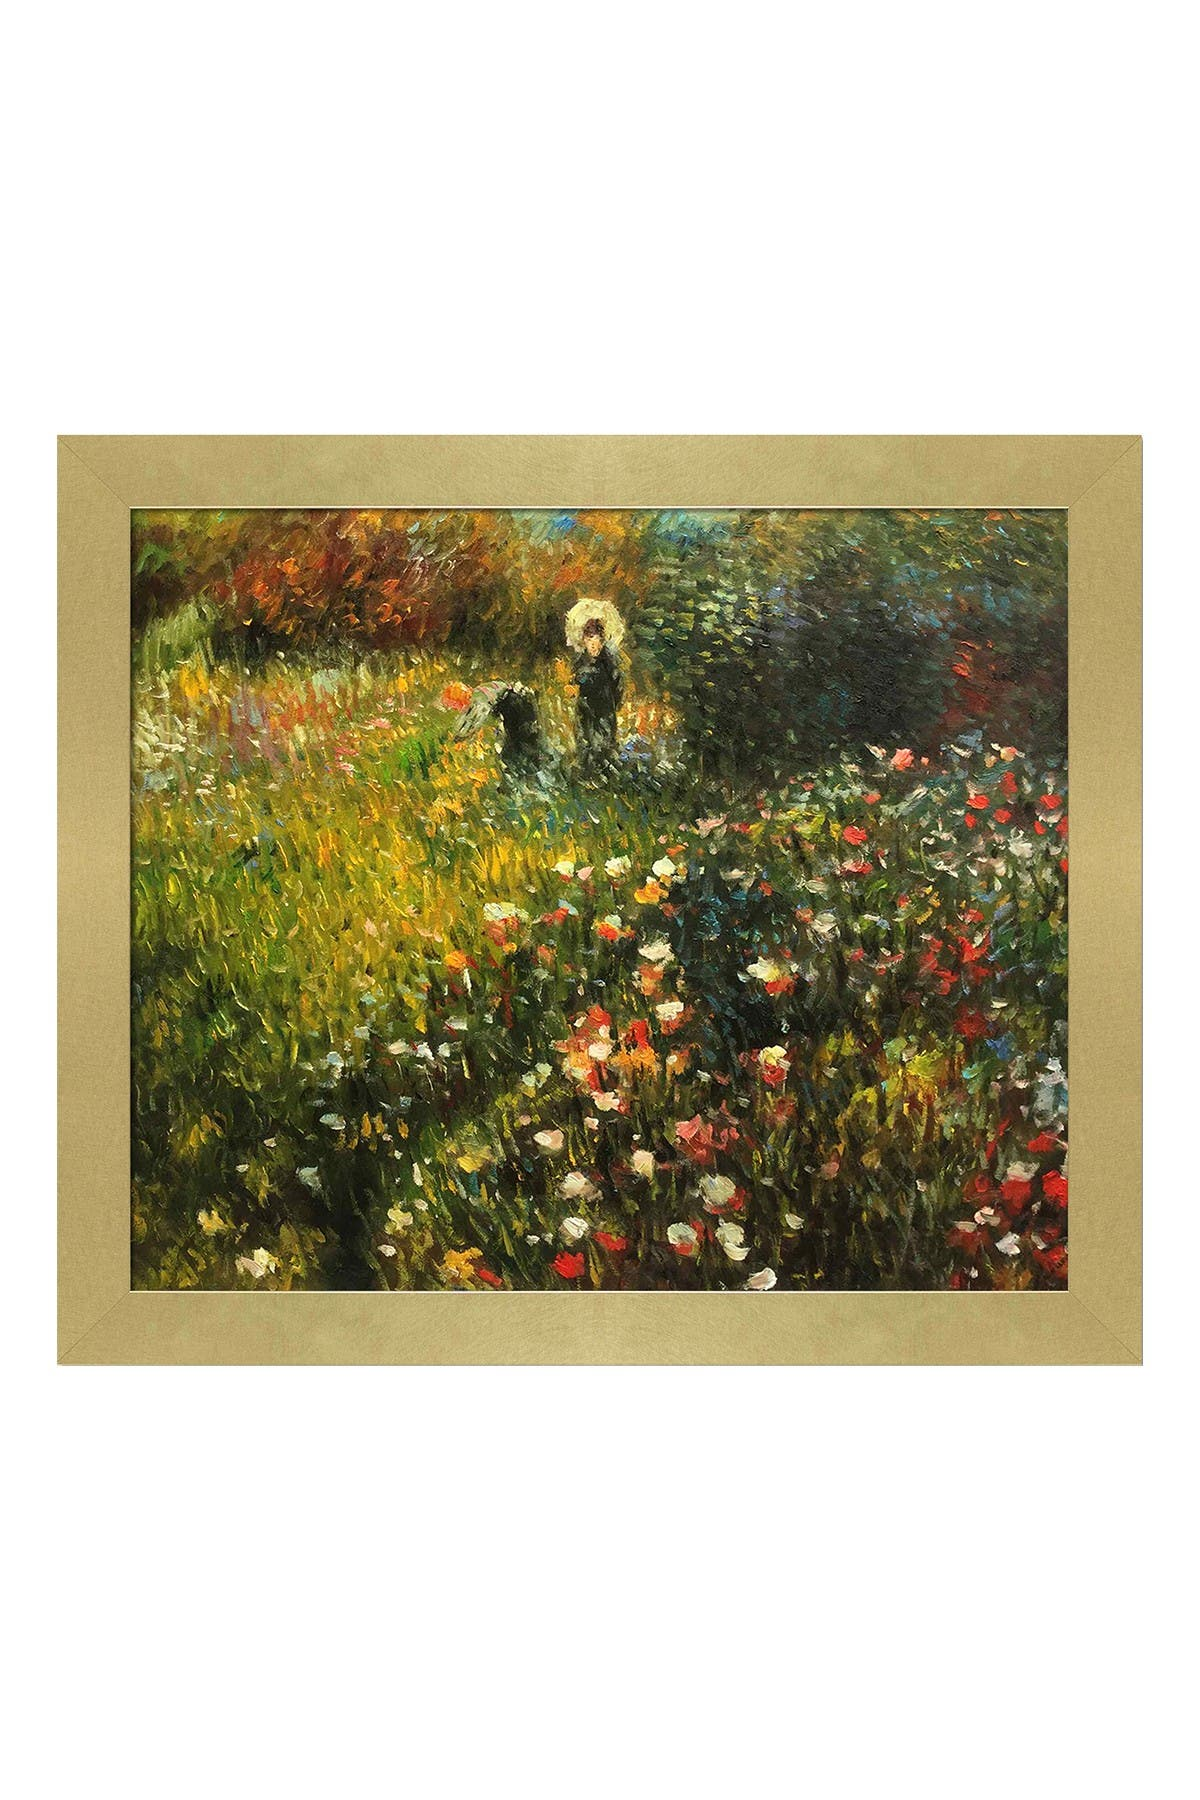 Woman with a parasol in a Garden (Frau mi Sonnenschirm) with Semplice Specchio Frame, 24\\\